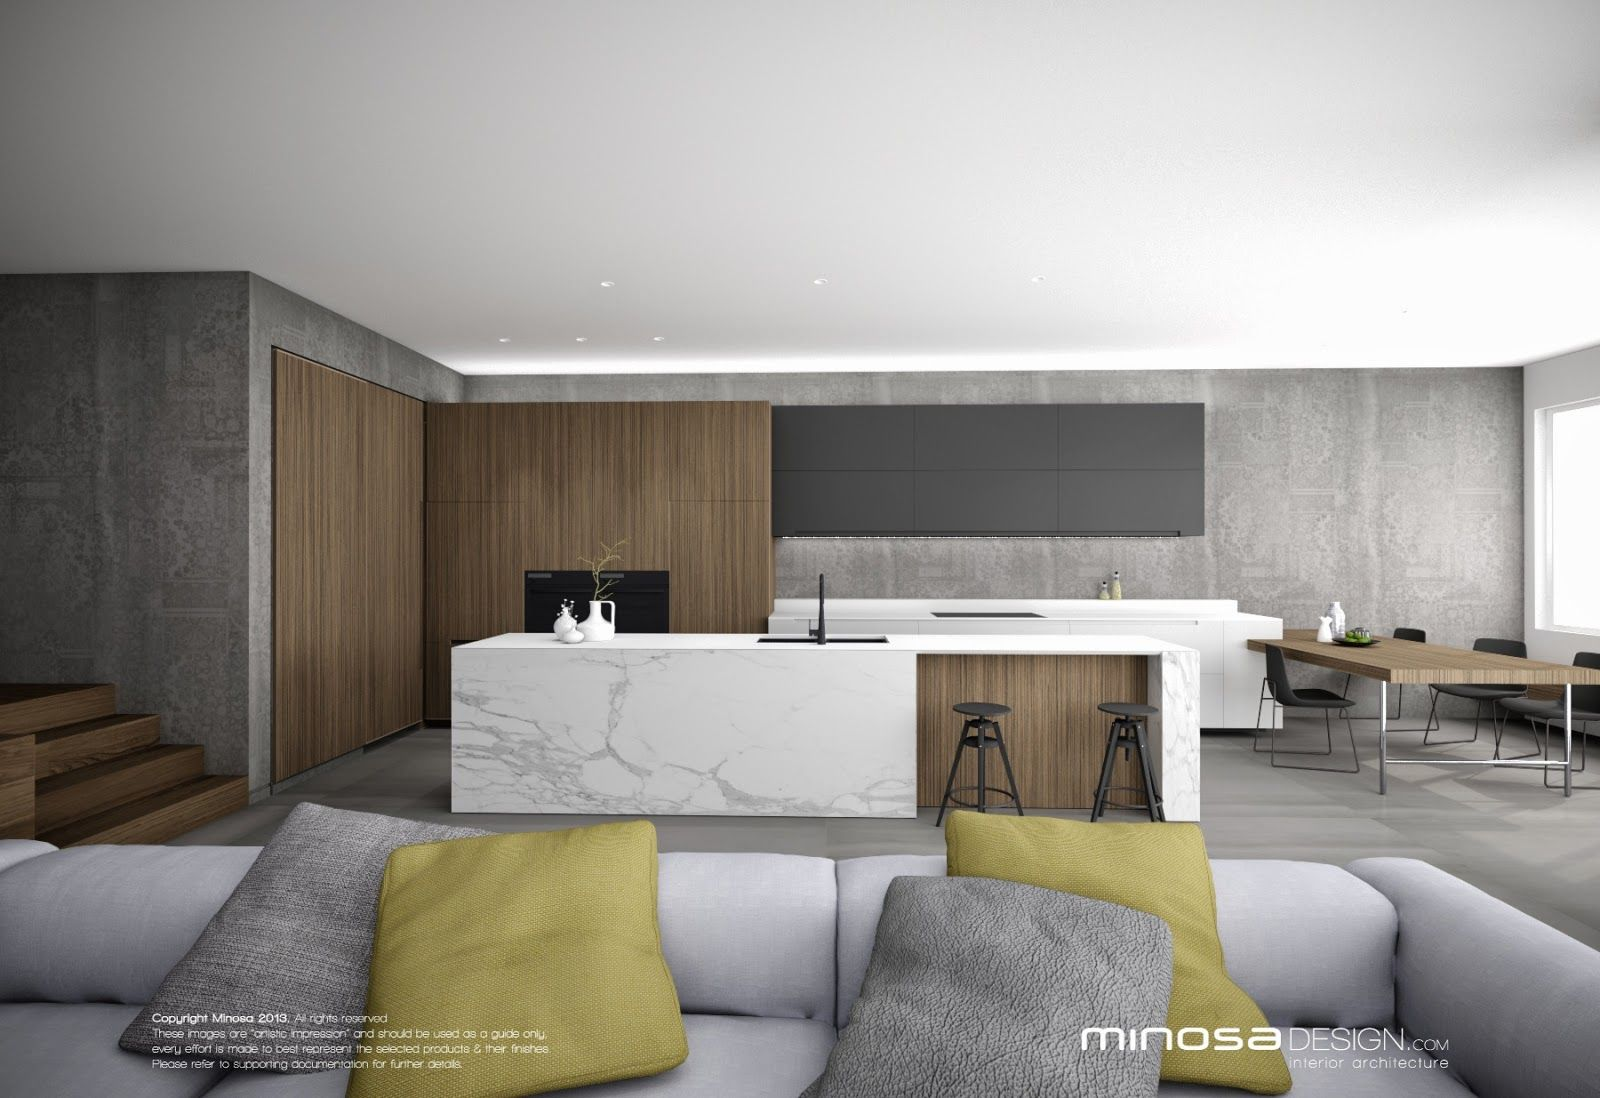 Minosa Design: 3D CAD making life easy? | Karacsony | Pinterest ...